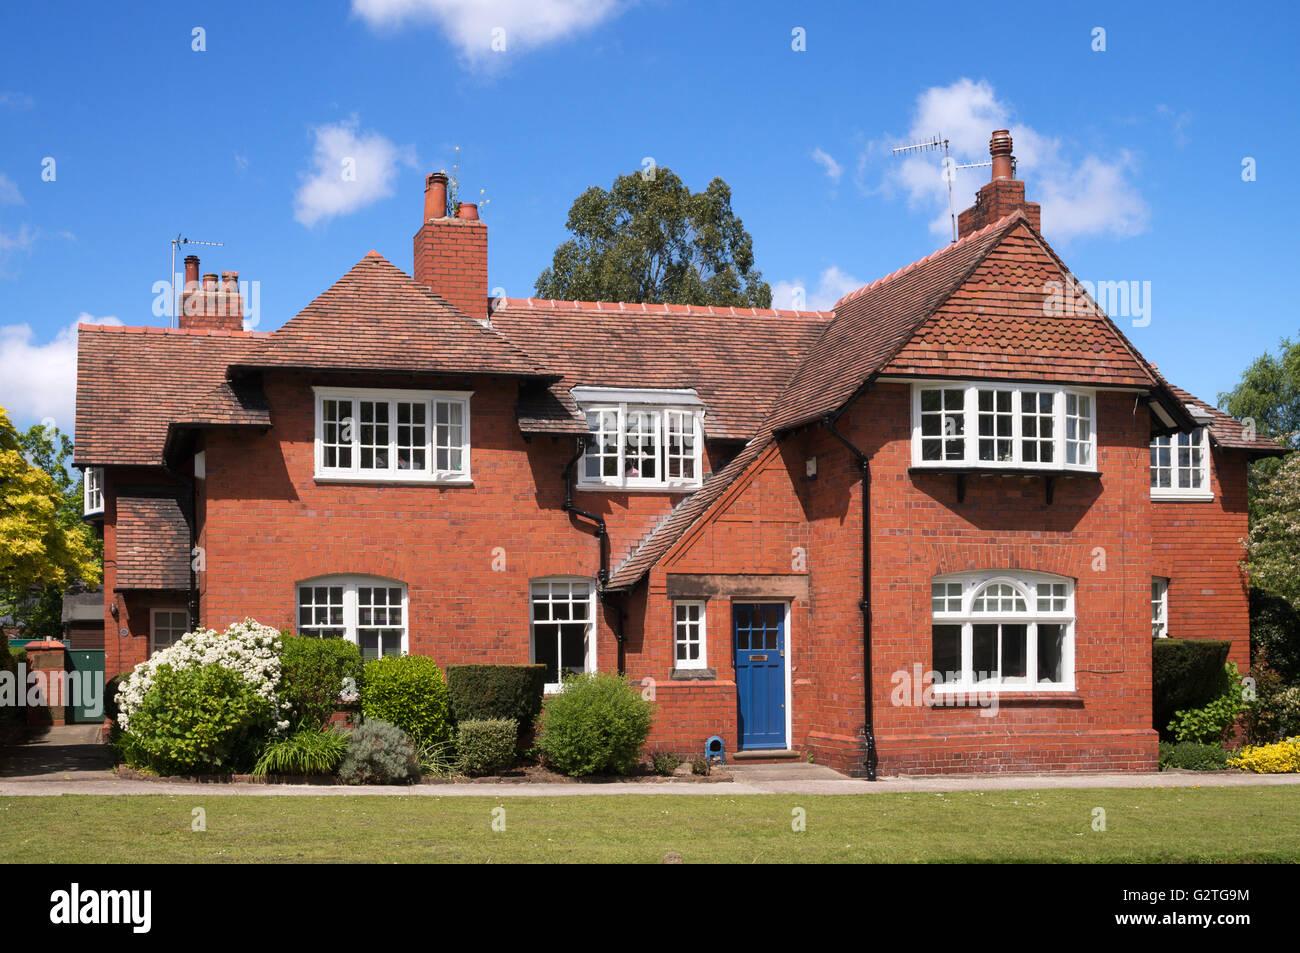 Houses 9 and  11  Bolton Road, Port Sunlight  model village, Merseyside, England, UK - Stock Image